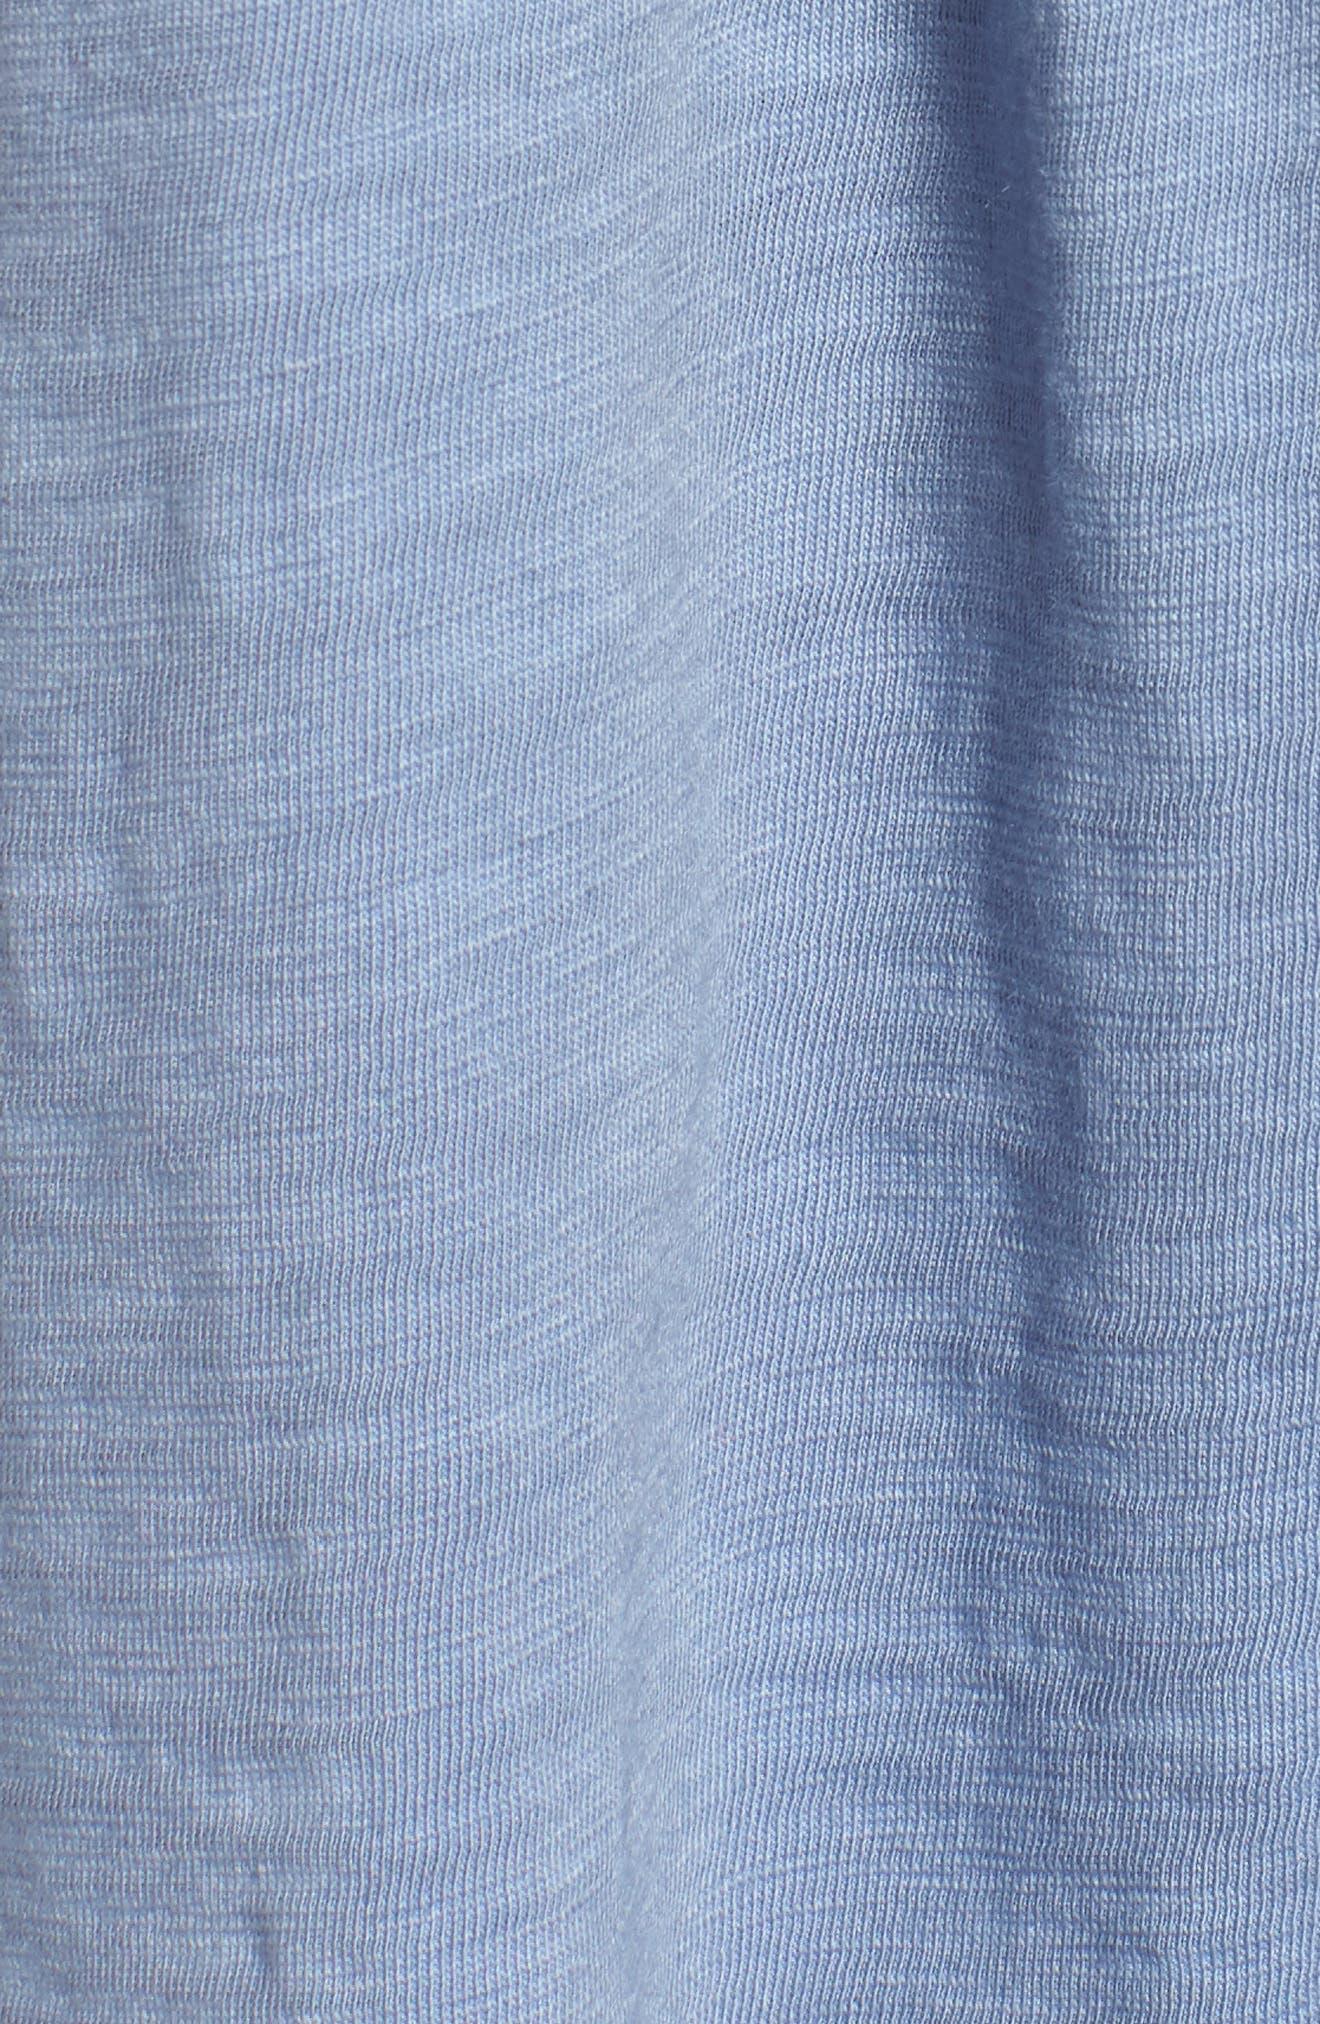 Tassel Trim Embroidered Tank,                             Alternate thumbnail 6, color,                             Blue Stonewash